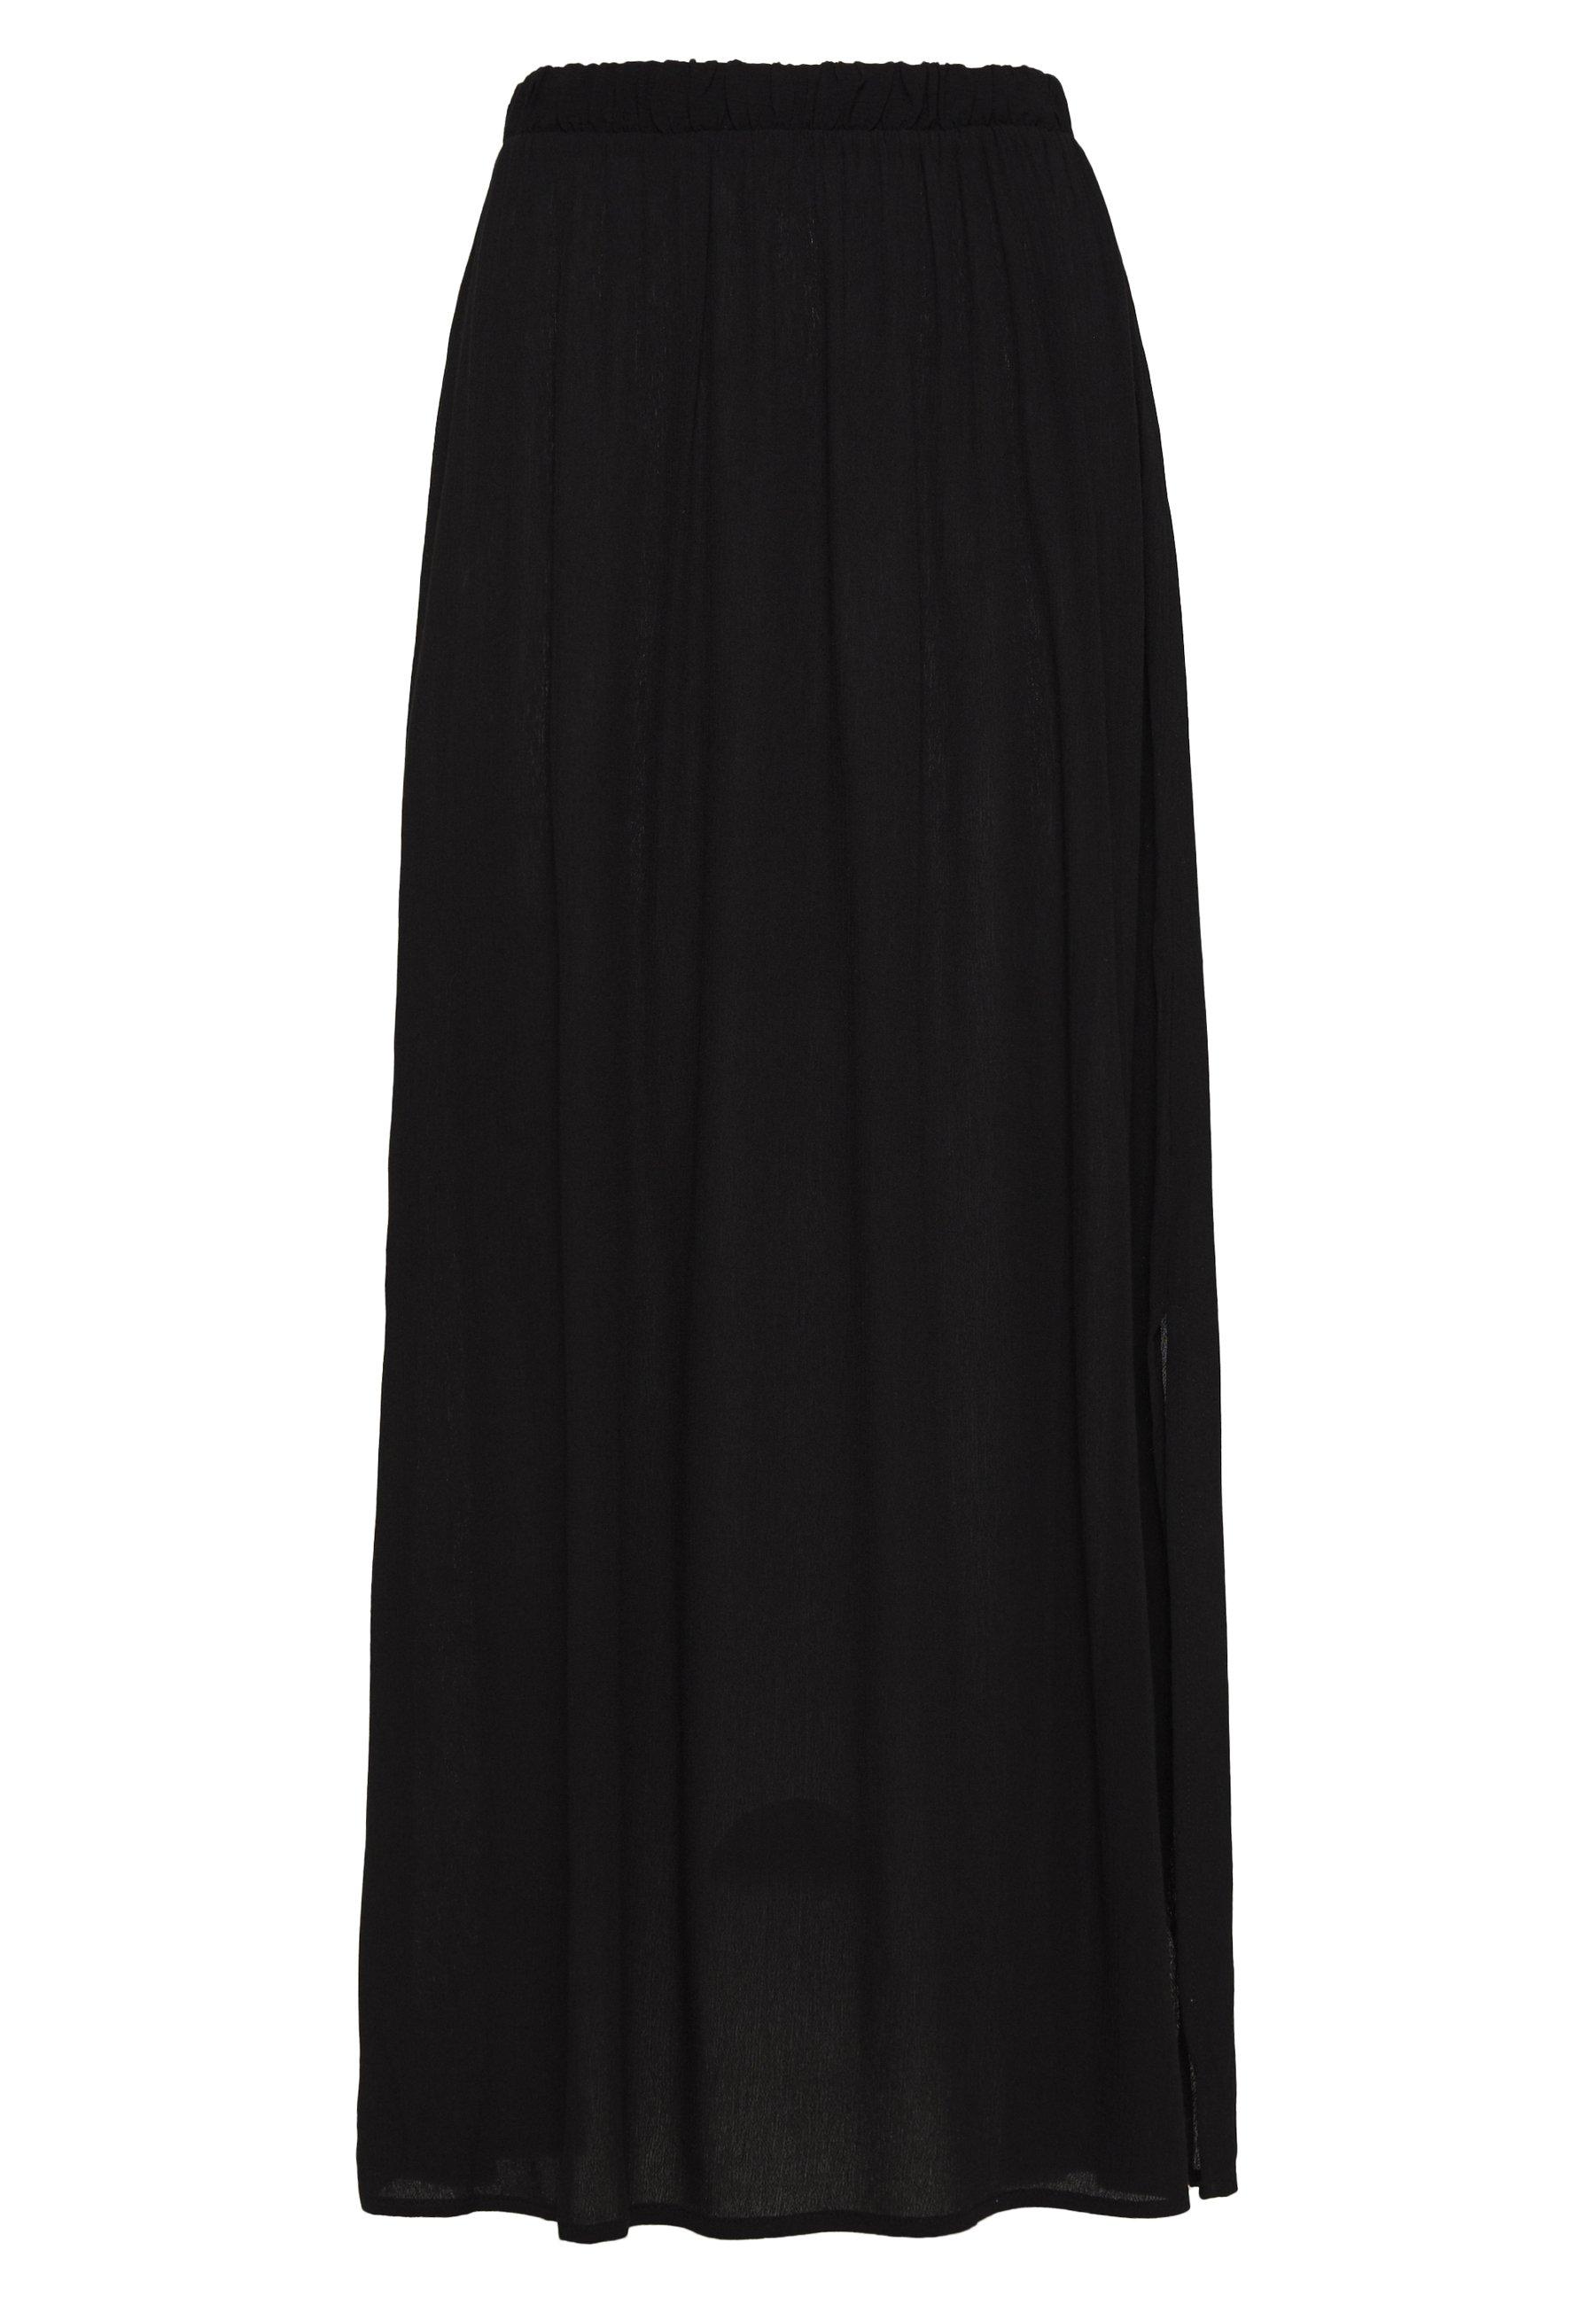 Femme IHMARRAKECH - Jupe plissée